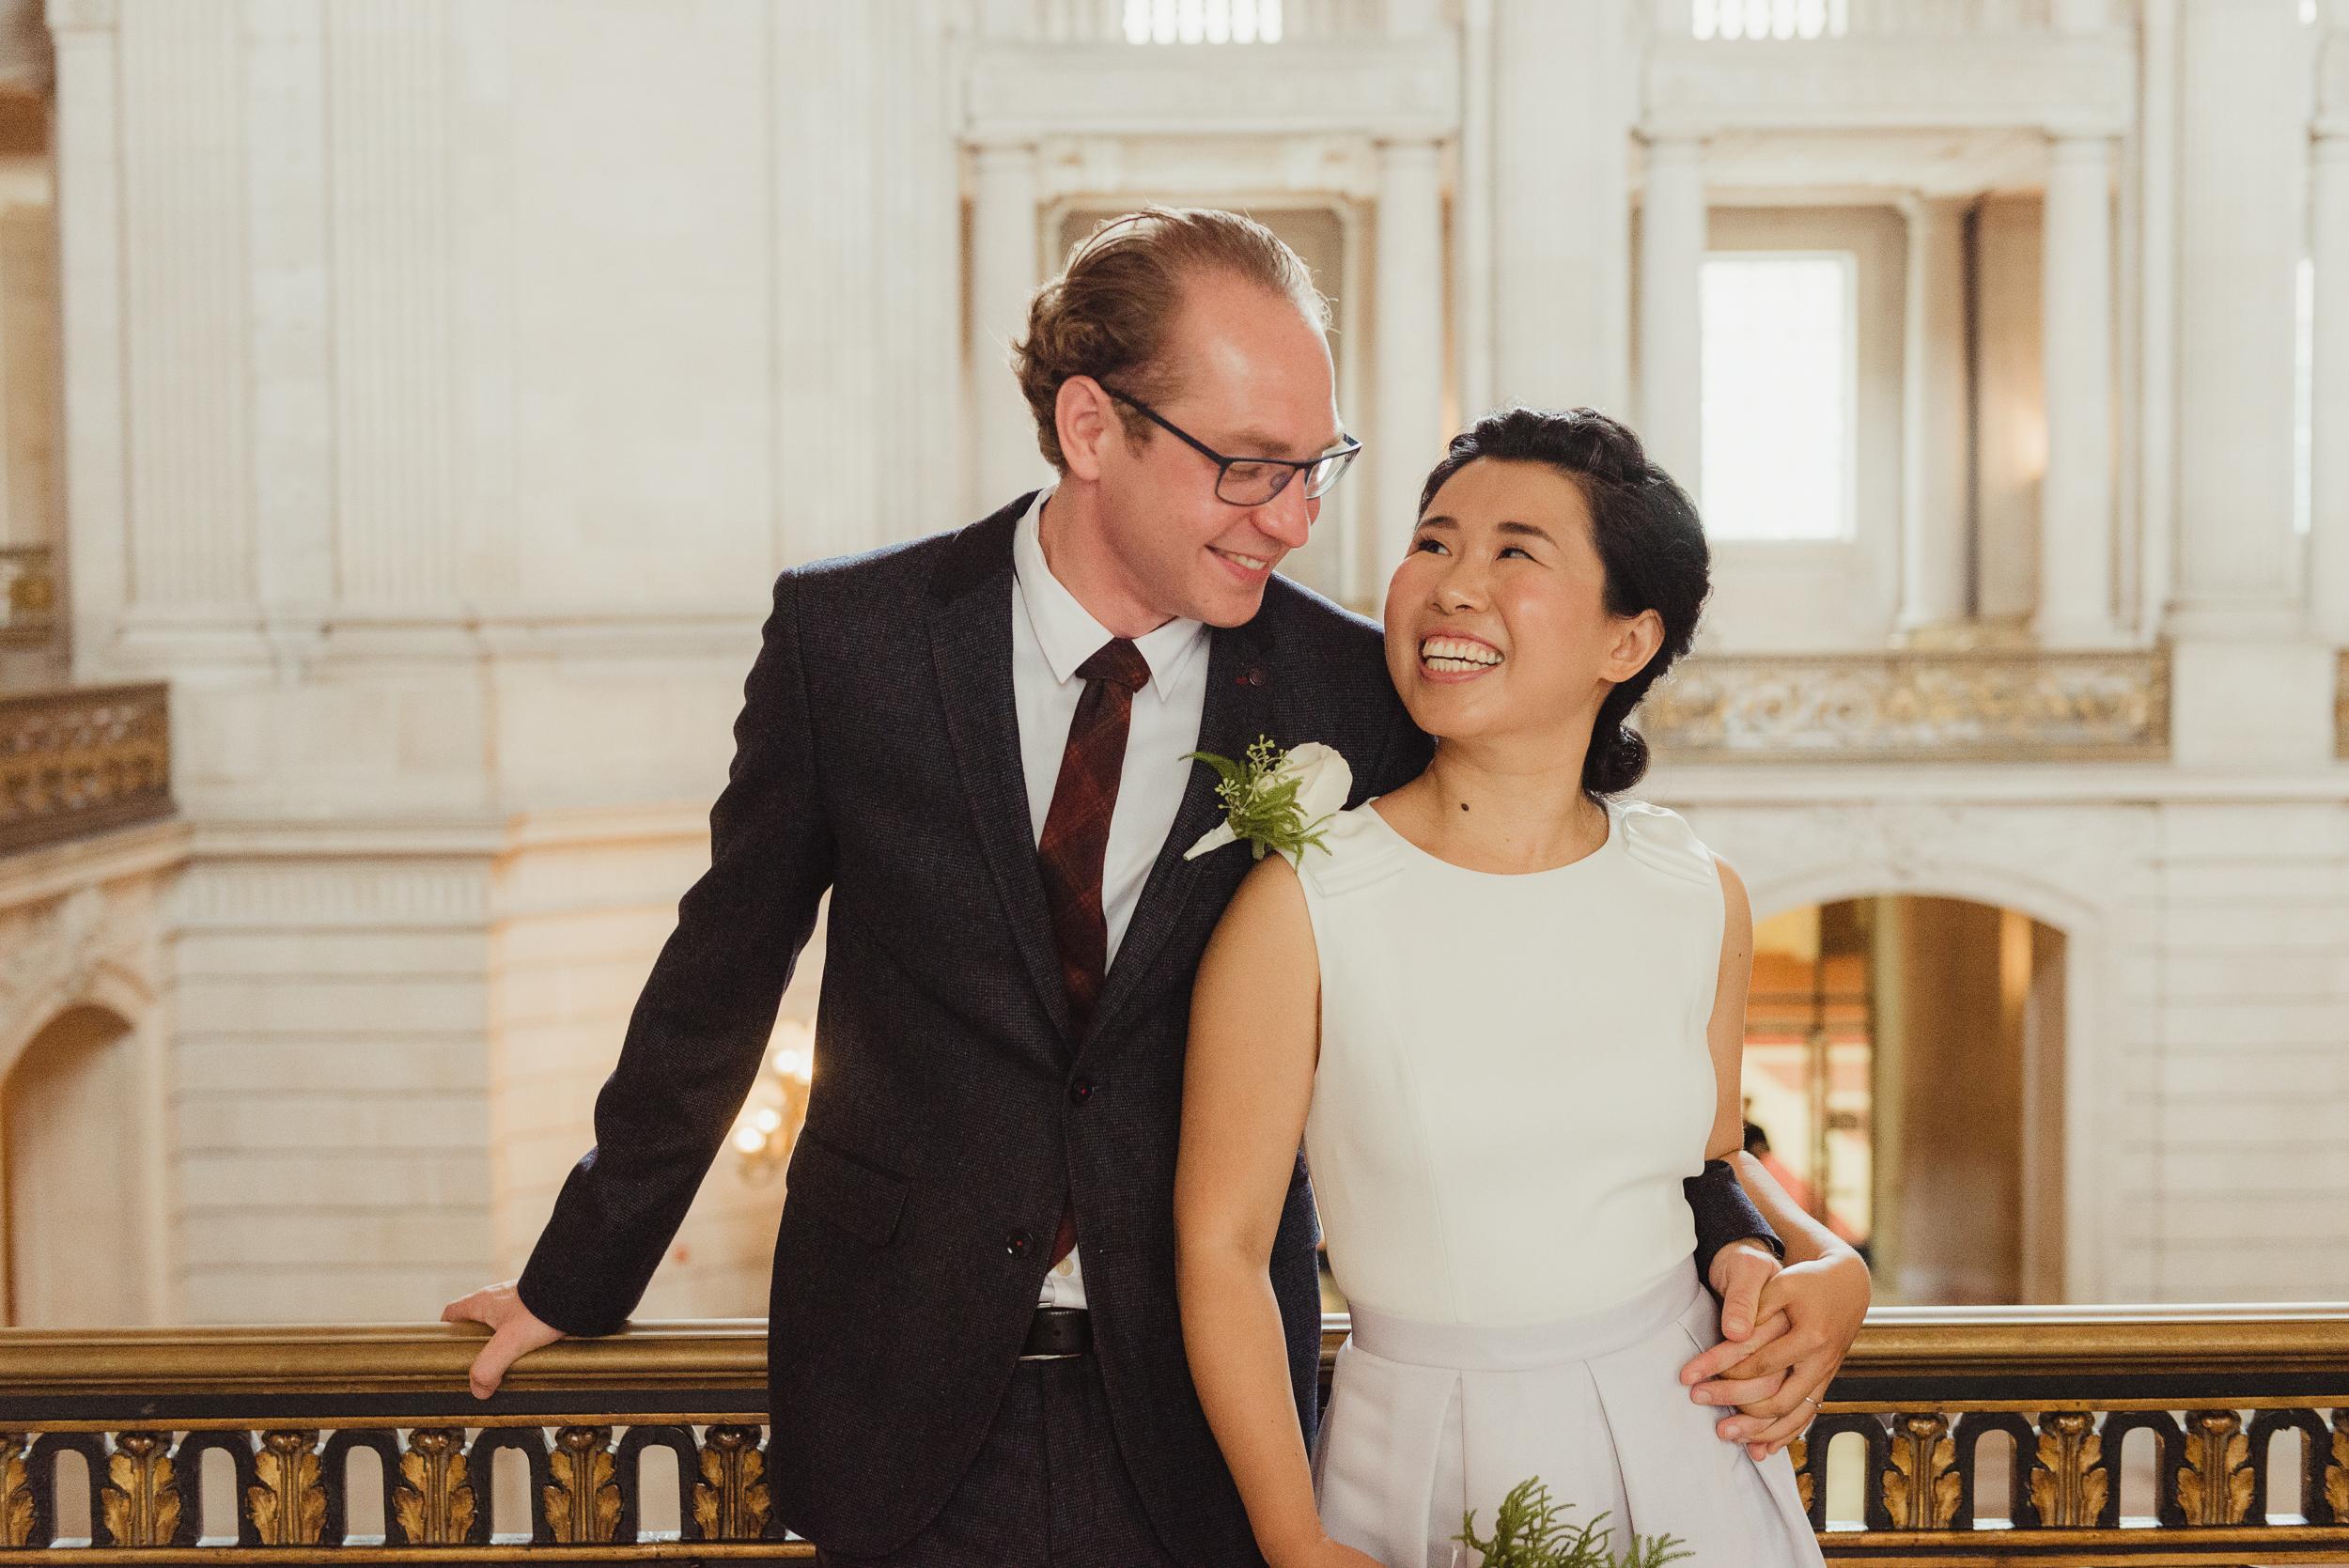 19-sf-city-hall-18-reasons-intimate-wedding-vivianchen-220.jpg